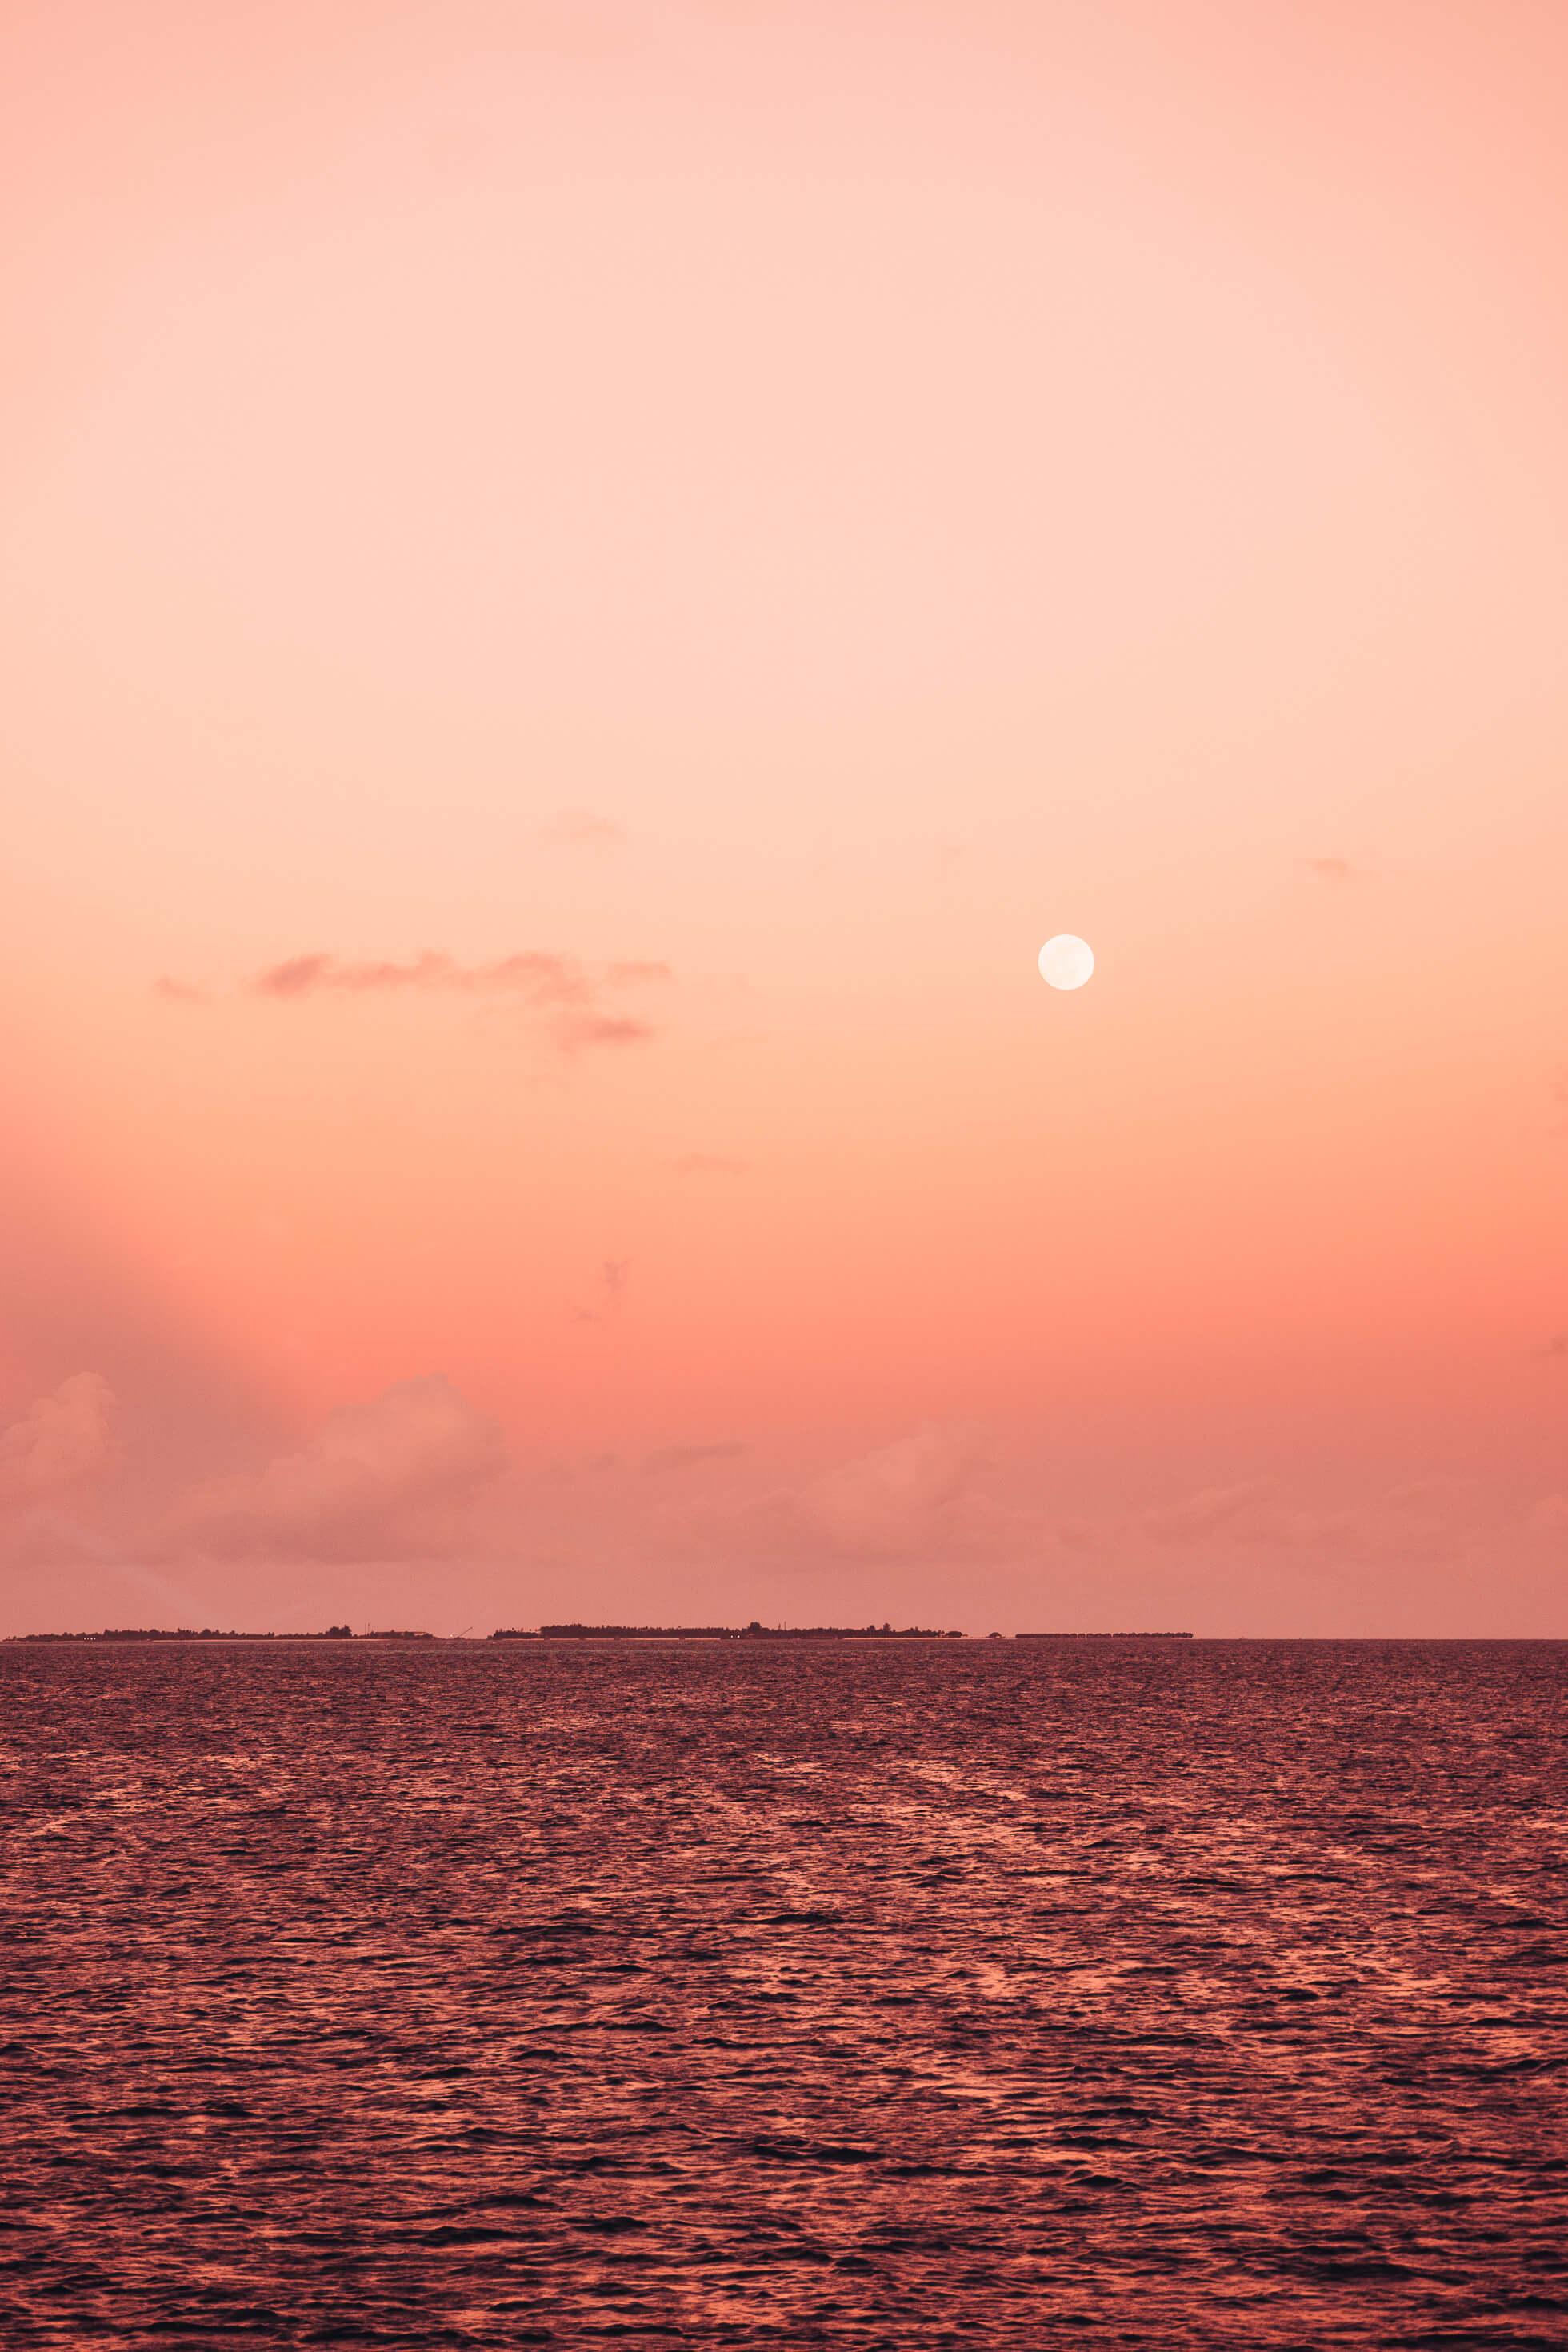 janni-deler-full-moon-maldivesj1310402